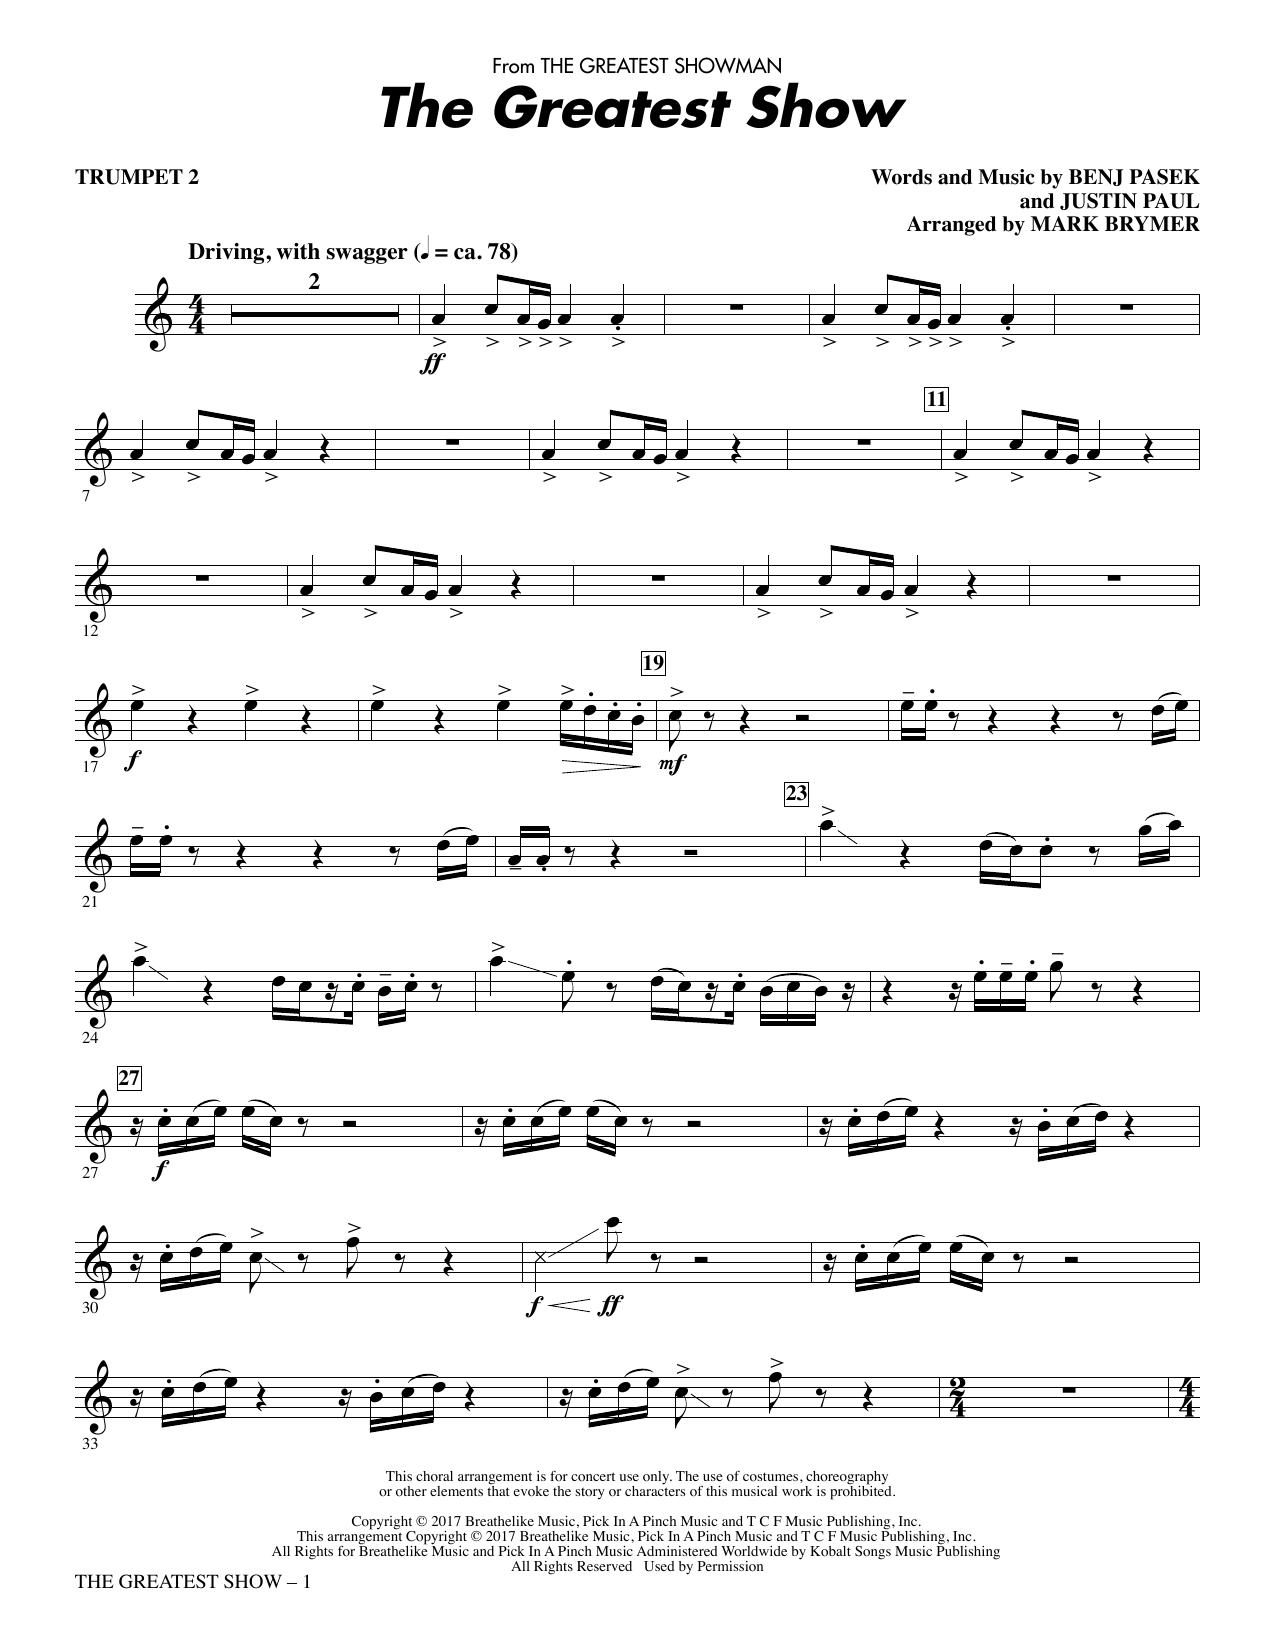 Pasek & Paul 'The Greatest Show - Trumpet 2' Sheet Music Notes, Chords |  Download Printable Choir Instrumental Pak - SKU: 375696